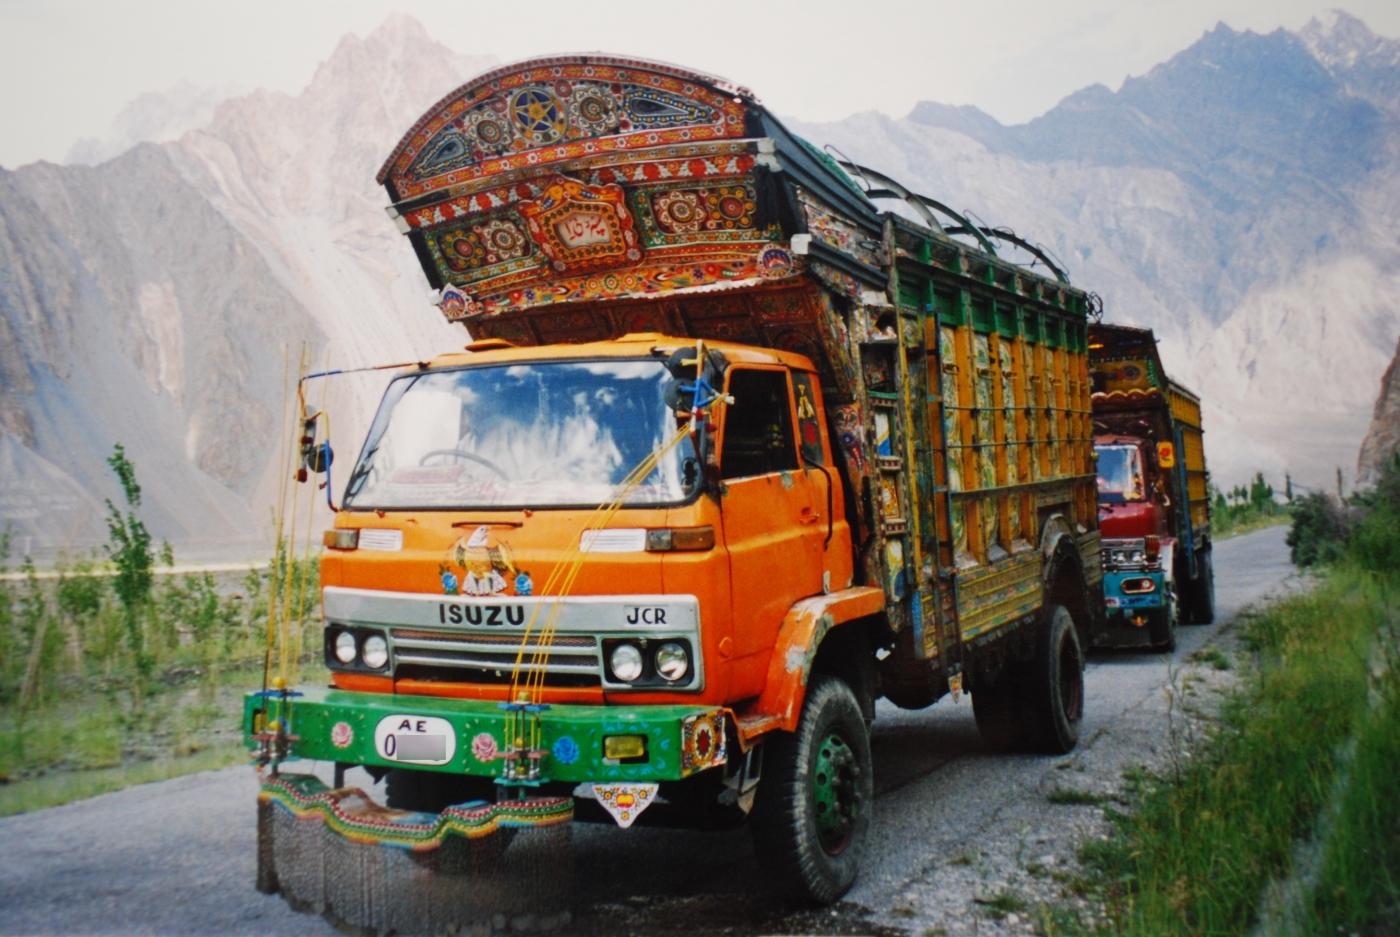 Pakistani truck in Karakoram Highway, passu, Northern Areas, Pakistan